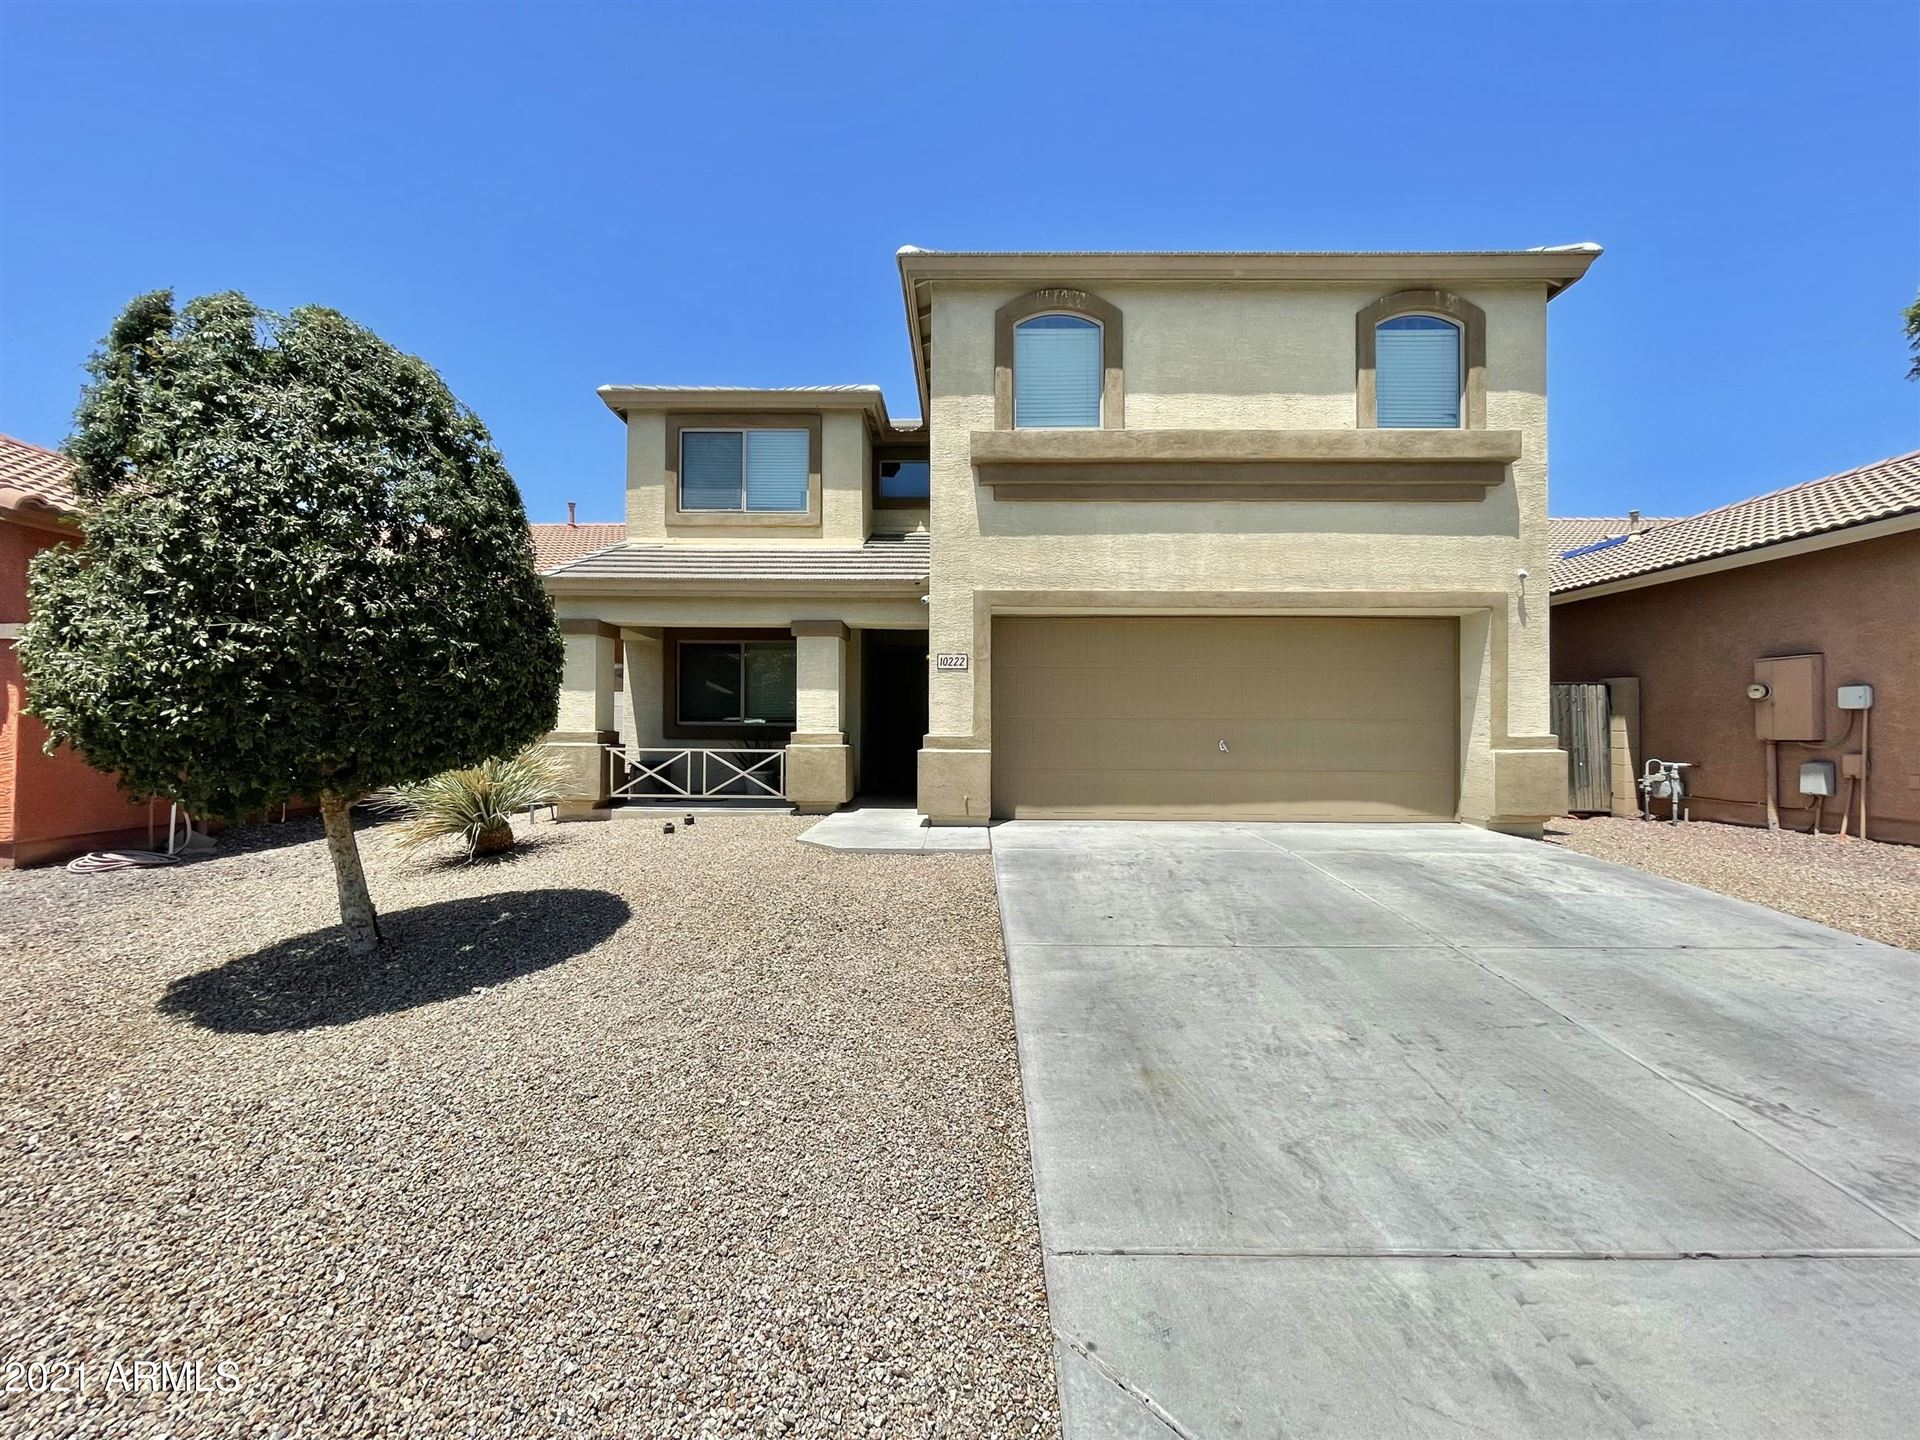 Photo of 10222 W HESS Street, Tolleson, AZ 85353 (MLS # 6271973)